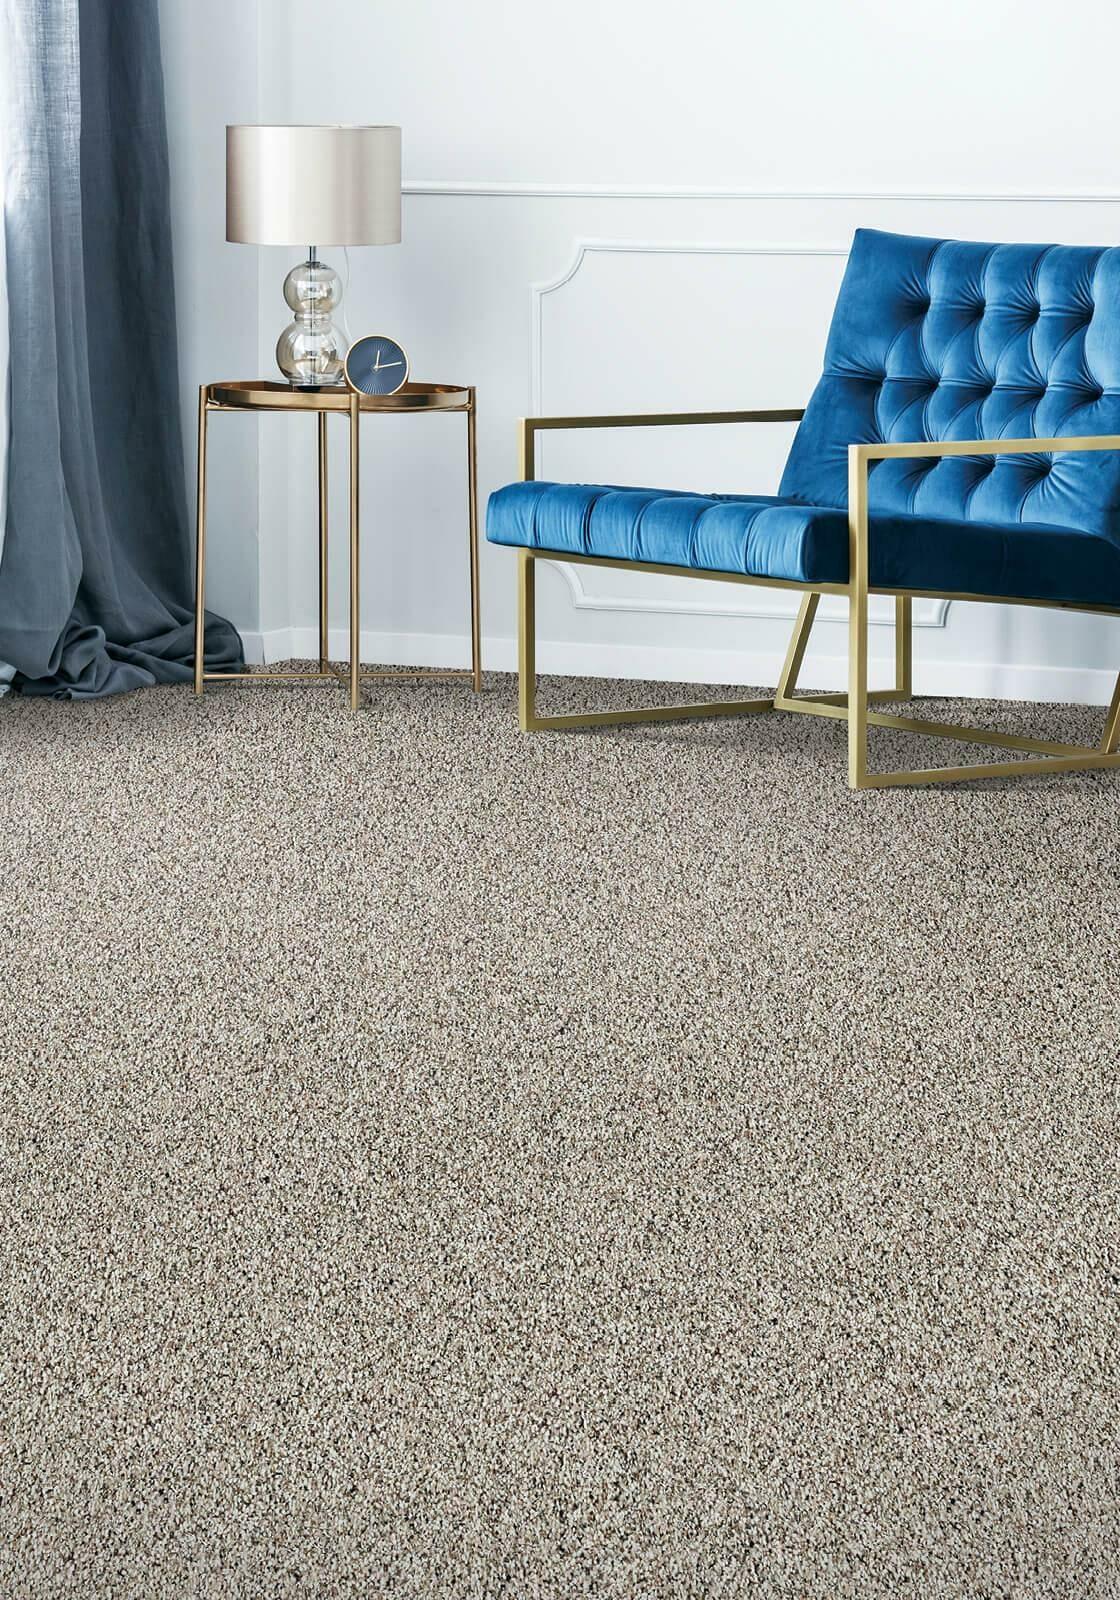 Choose Carpet For Allergies Portrait, Paneling Factory Of Virginia